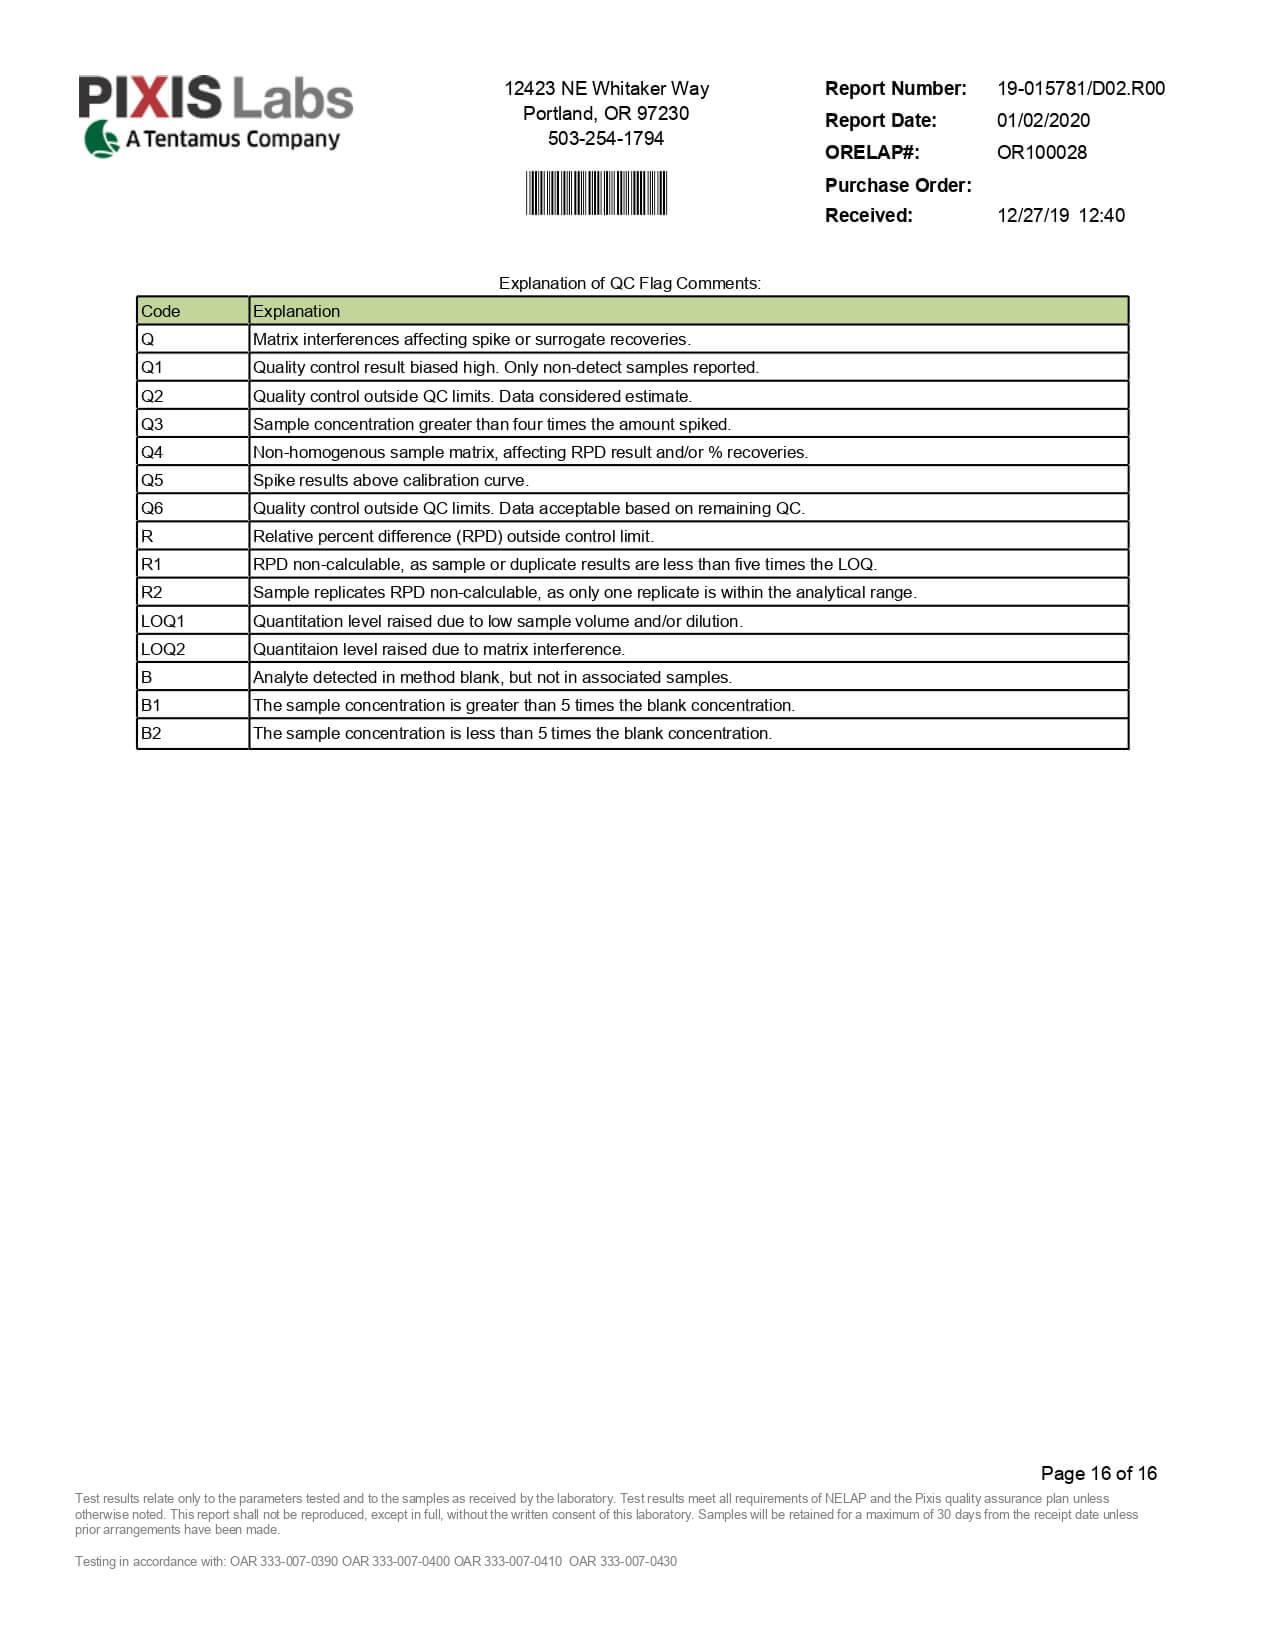 Social CBD Cooling Roll-On Gel 300mg Lab Report